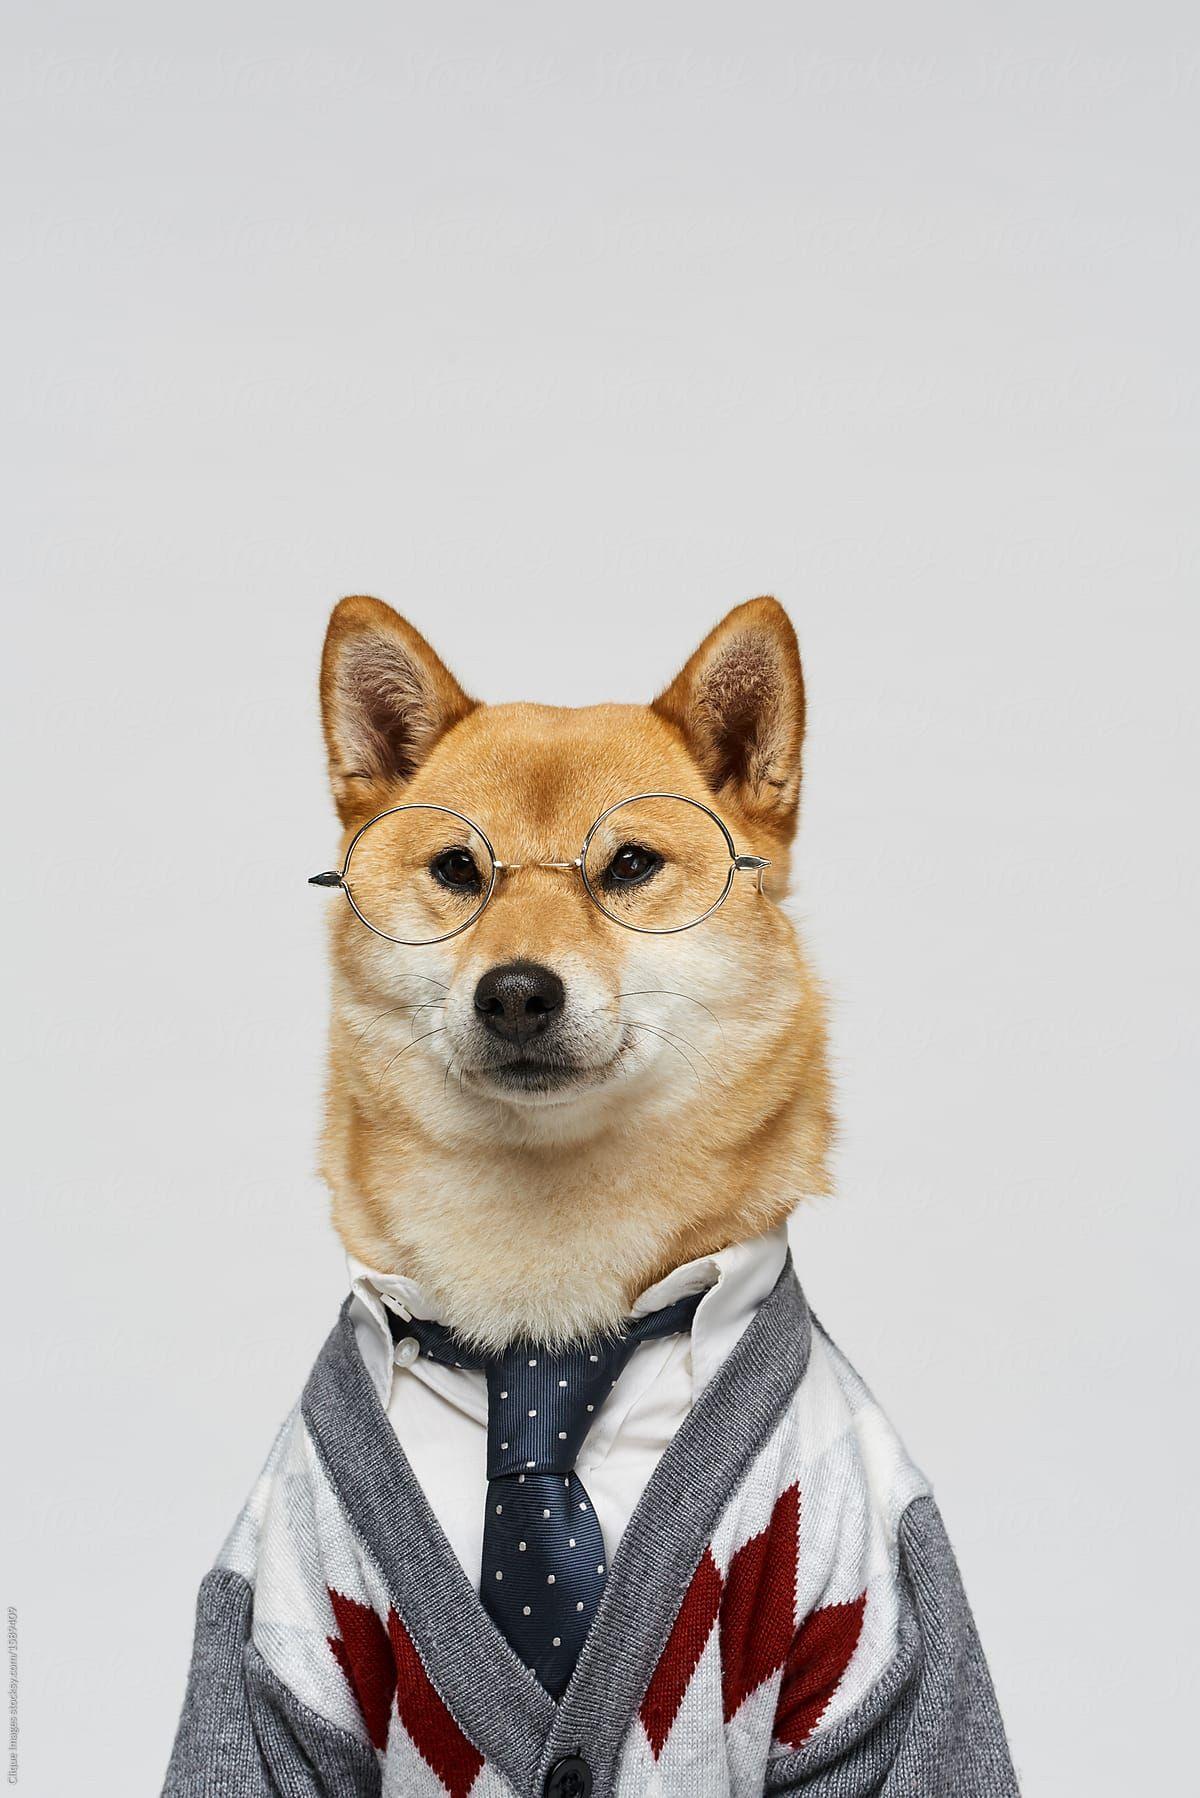 Portrait Of Charming Shiba Inu Wearing Glasses Stylish Cardigan And Tie On White Wall Background Cute Animals Menswear Dog Animals